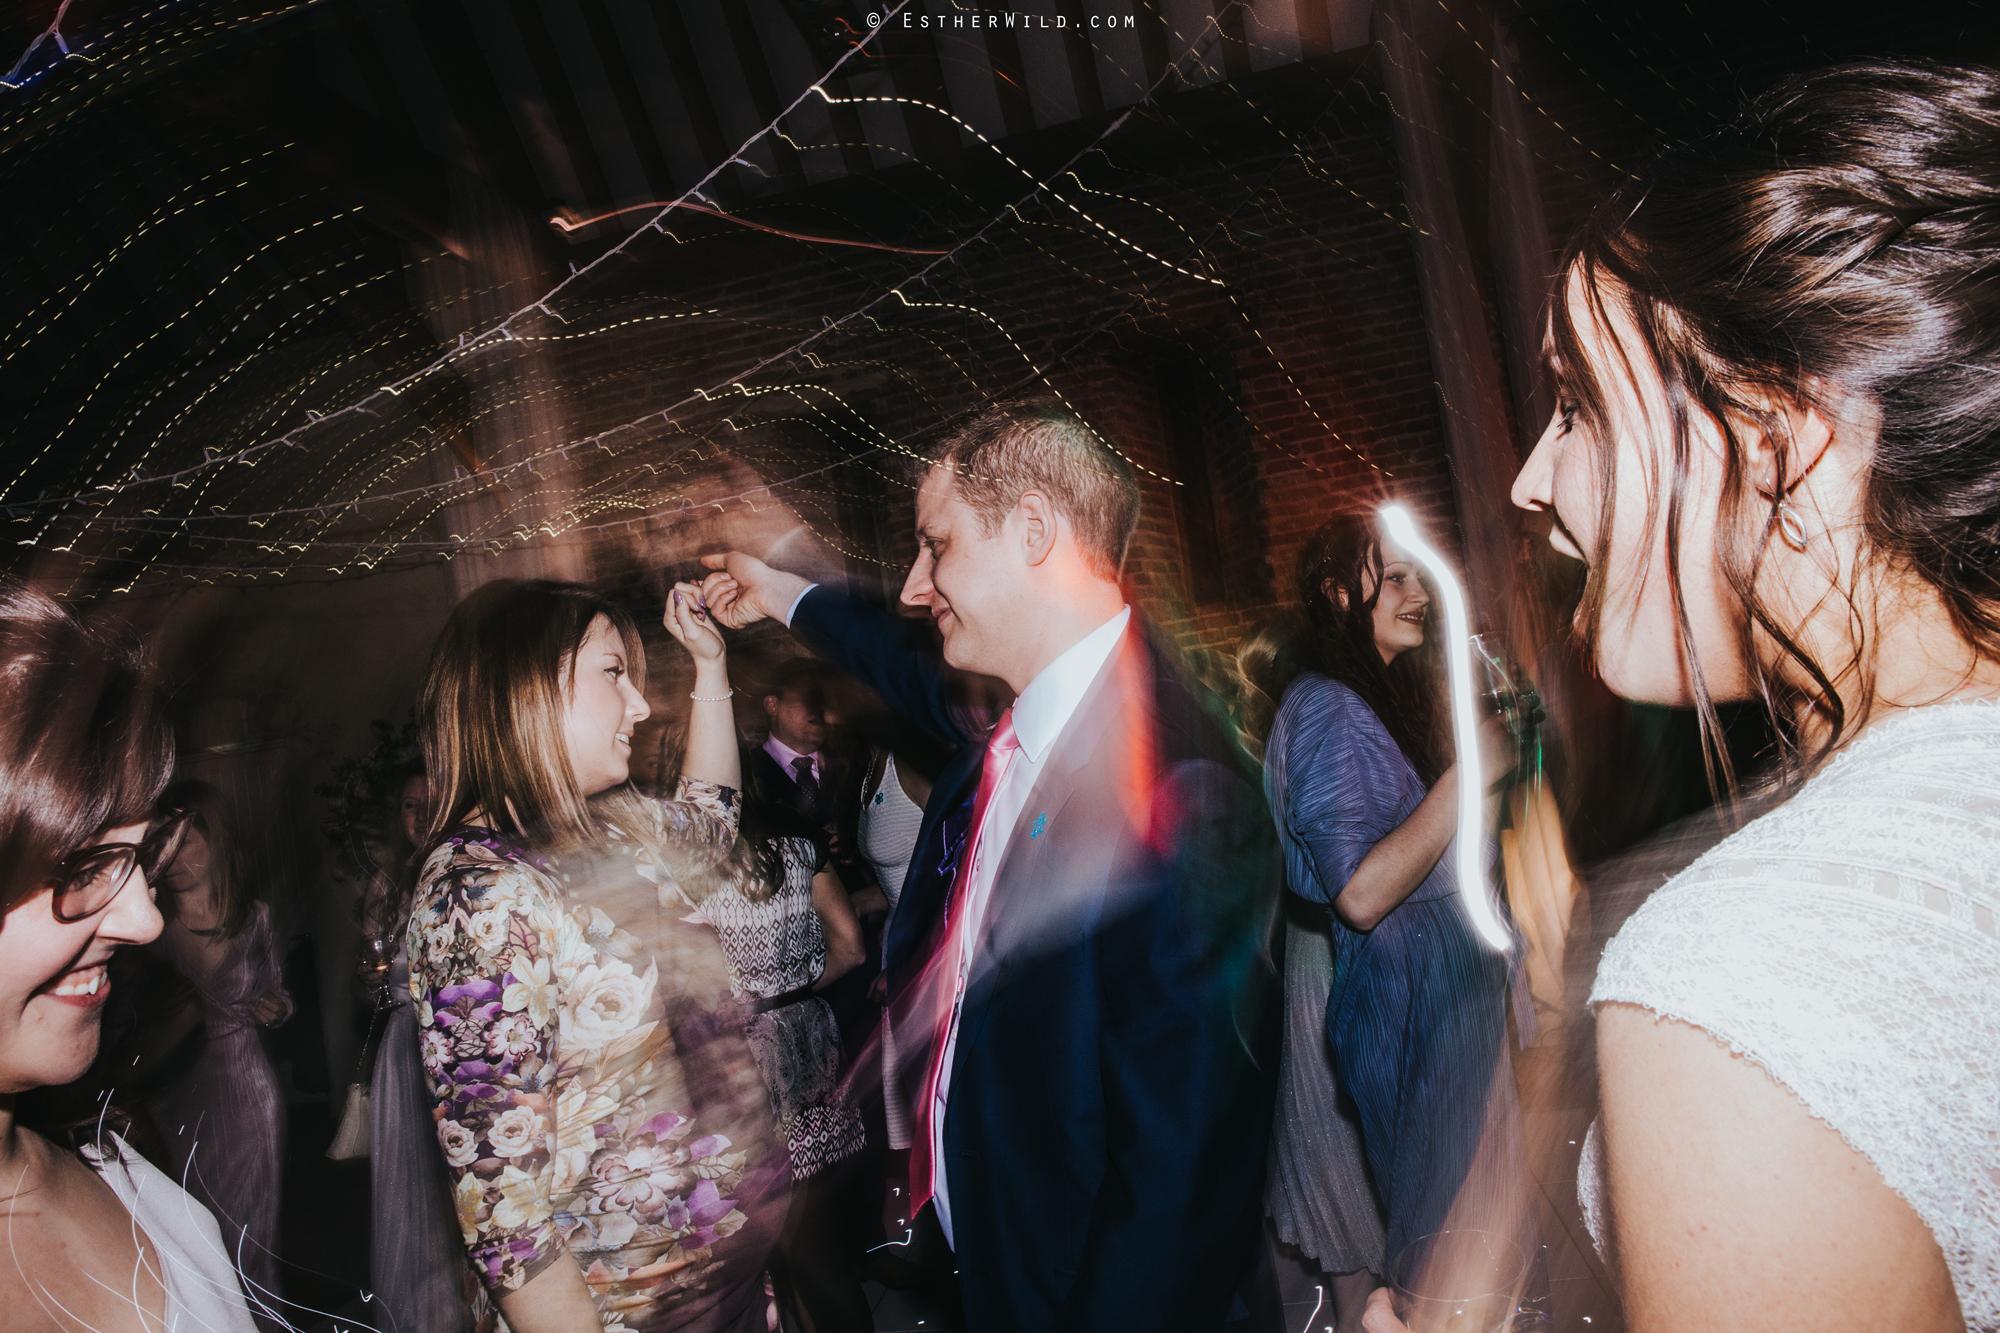 Elms_Barn_Weddings_Suffolk_Photographer_Copyright_Esther_Wild_IMG_3678.jpg